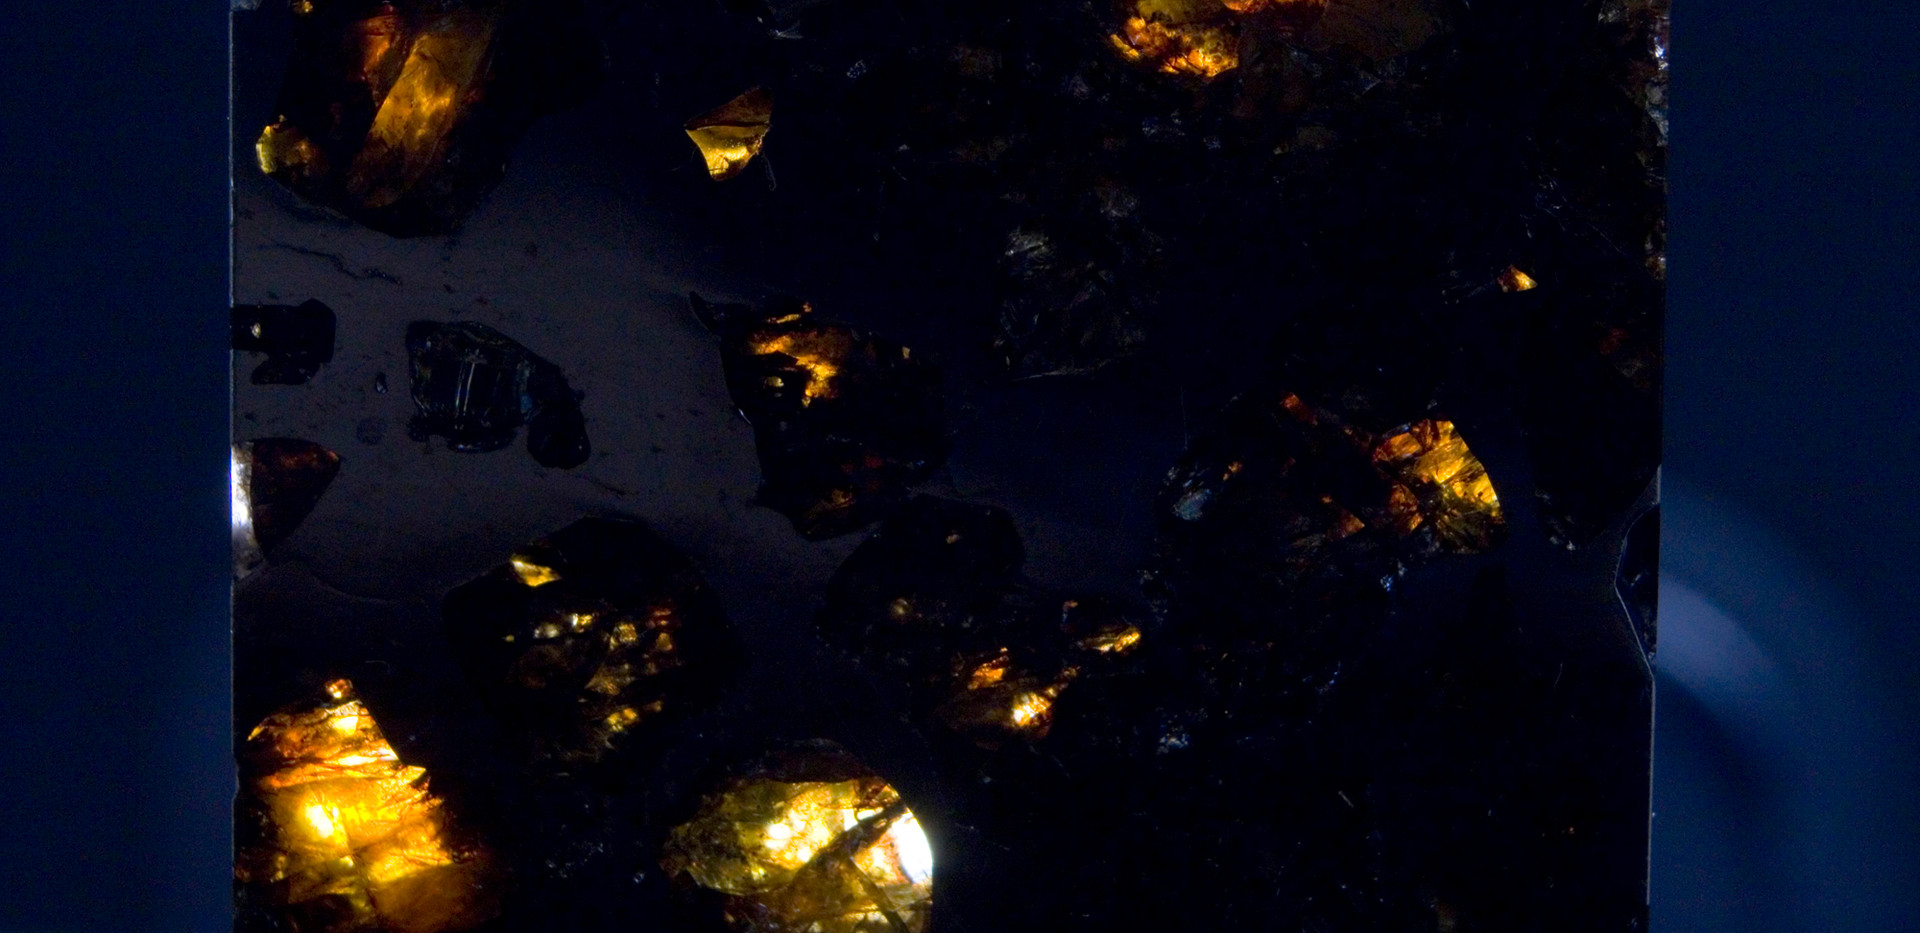 Imilac Pallasite Meteorite Backlit SMIM02